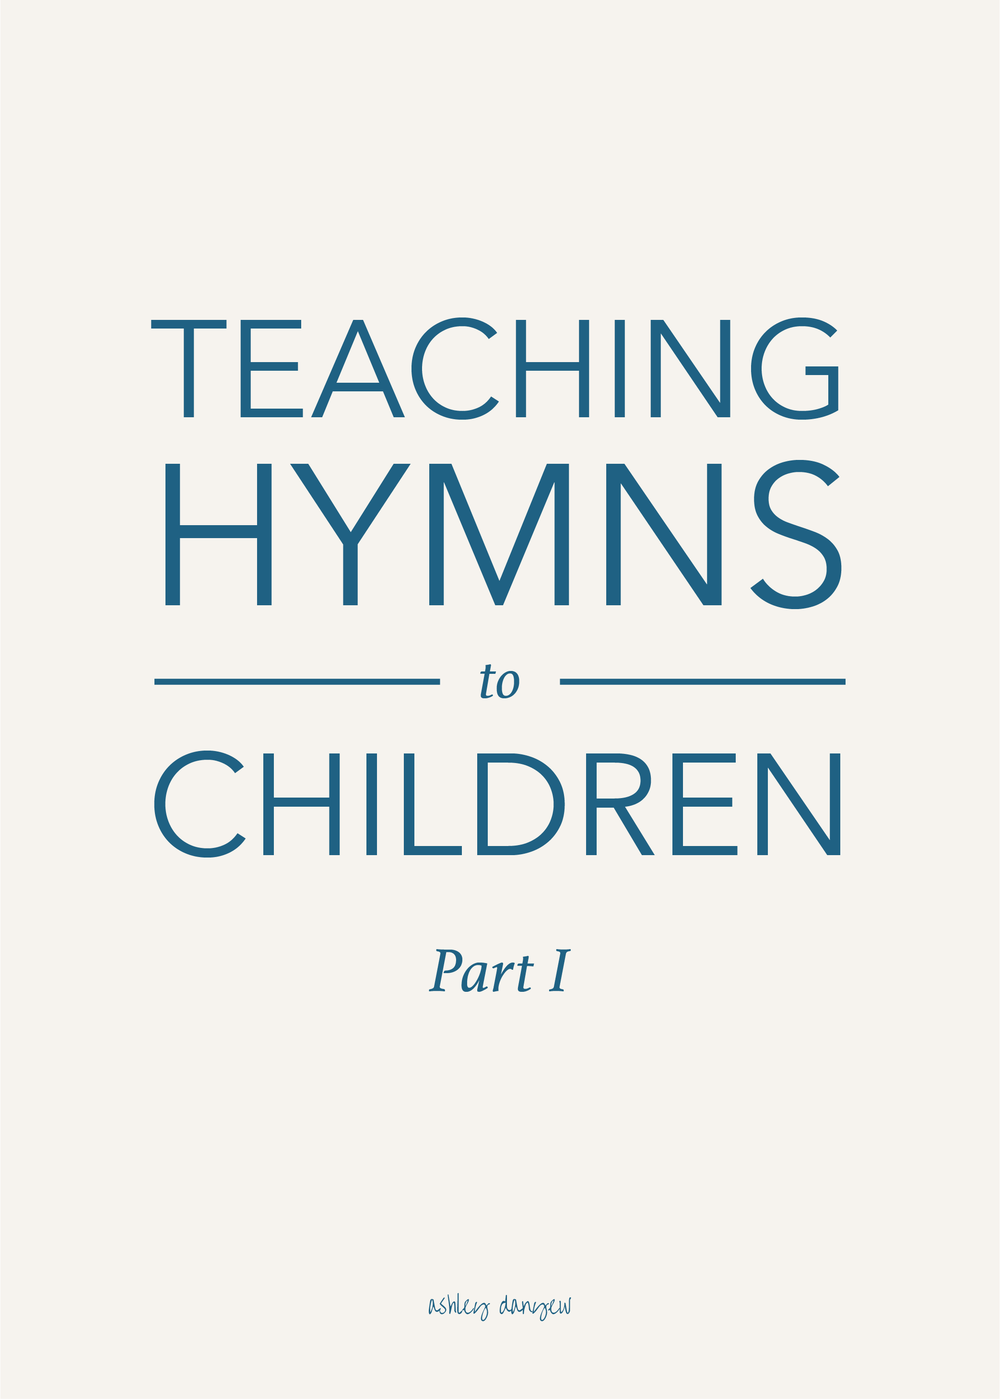 Teaching Hymns to Children_I.png